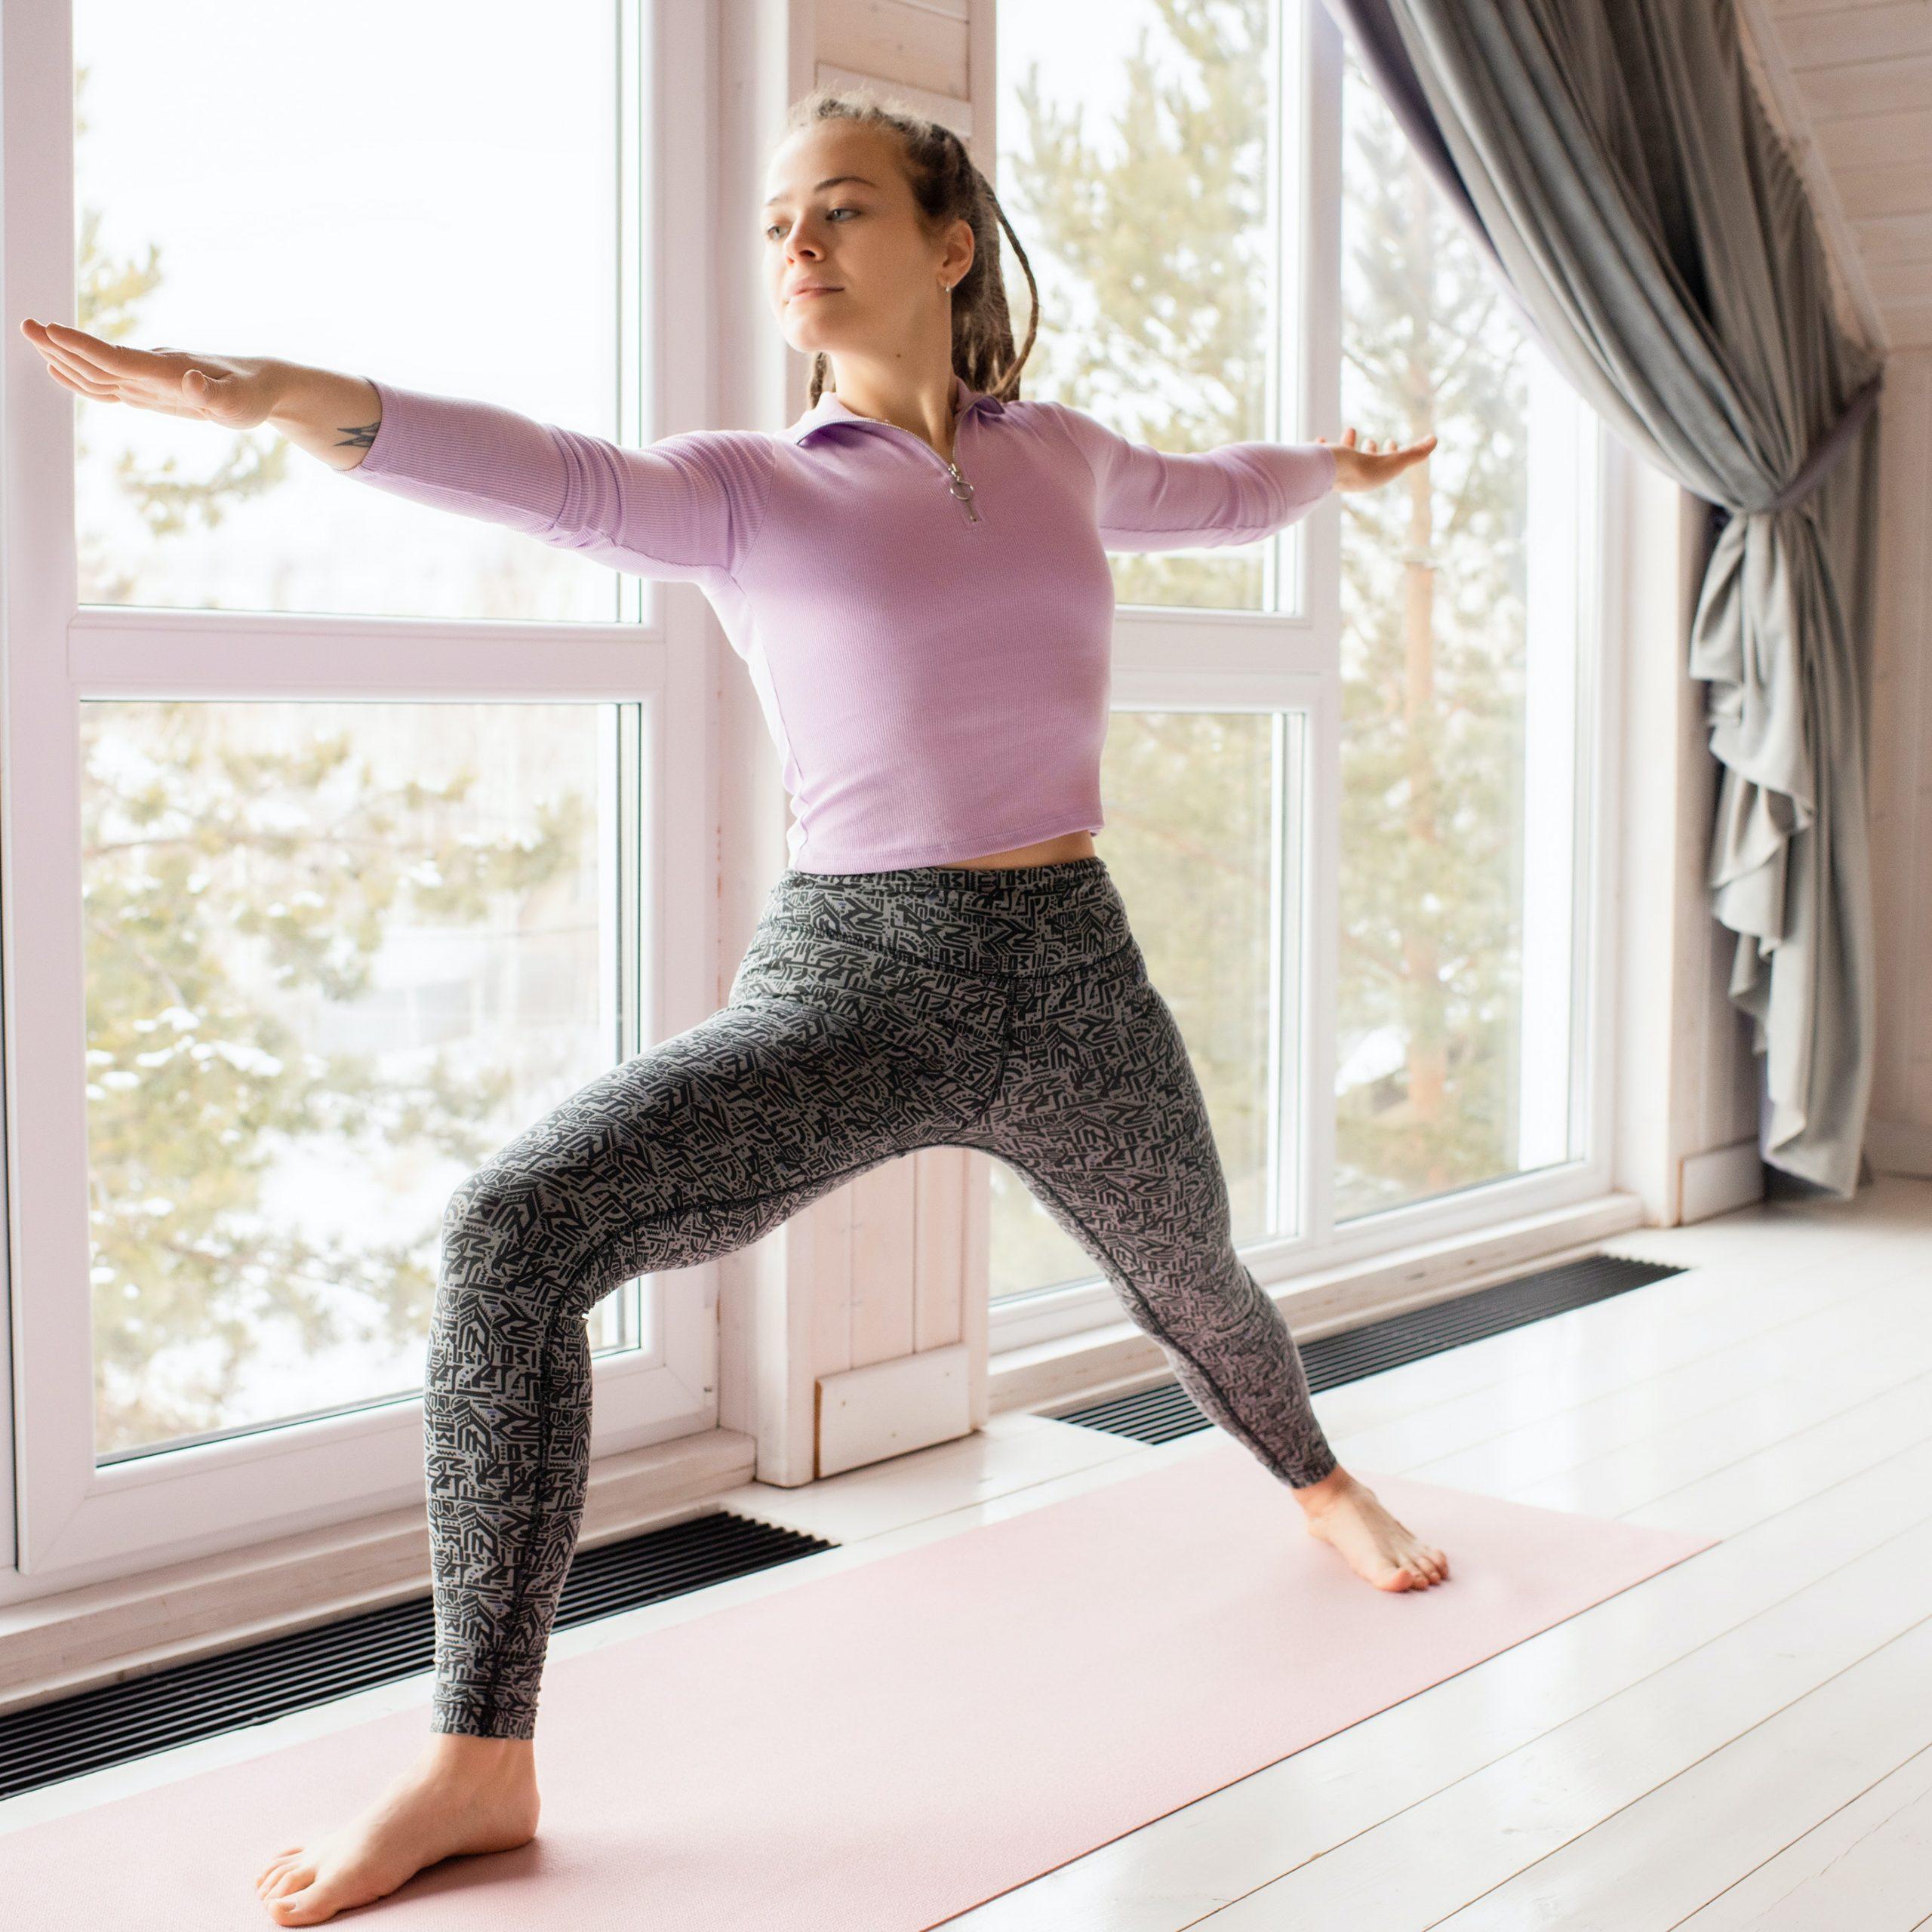 Yoga for Longevity: Enjoy Healthy Ageing and Longevity